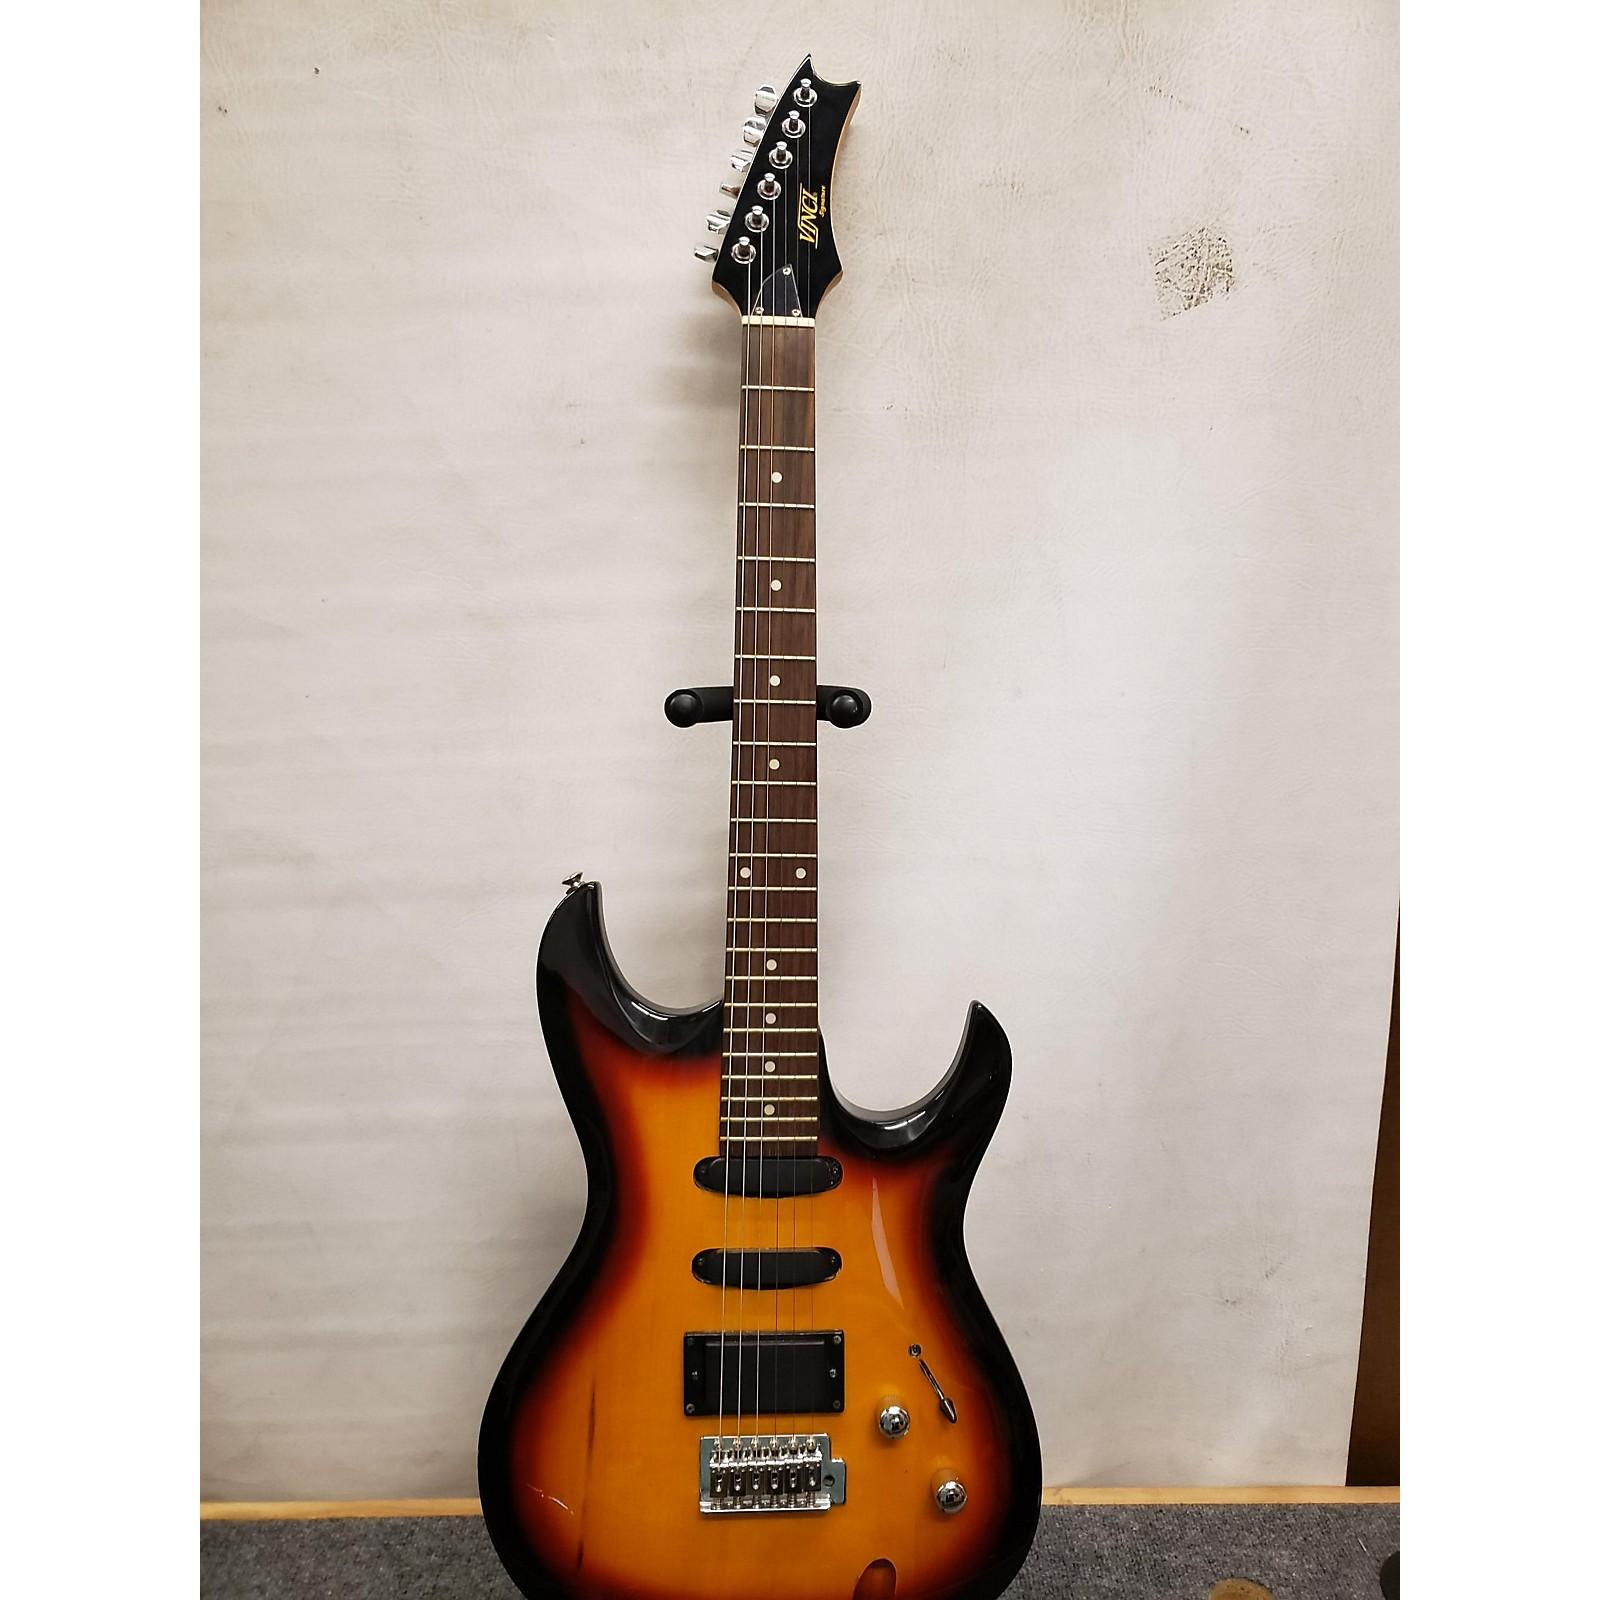 Vinci Signature Solid Body Electric Guitar